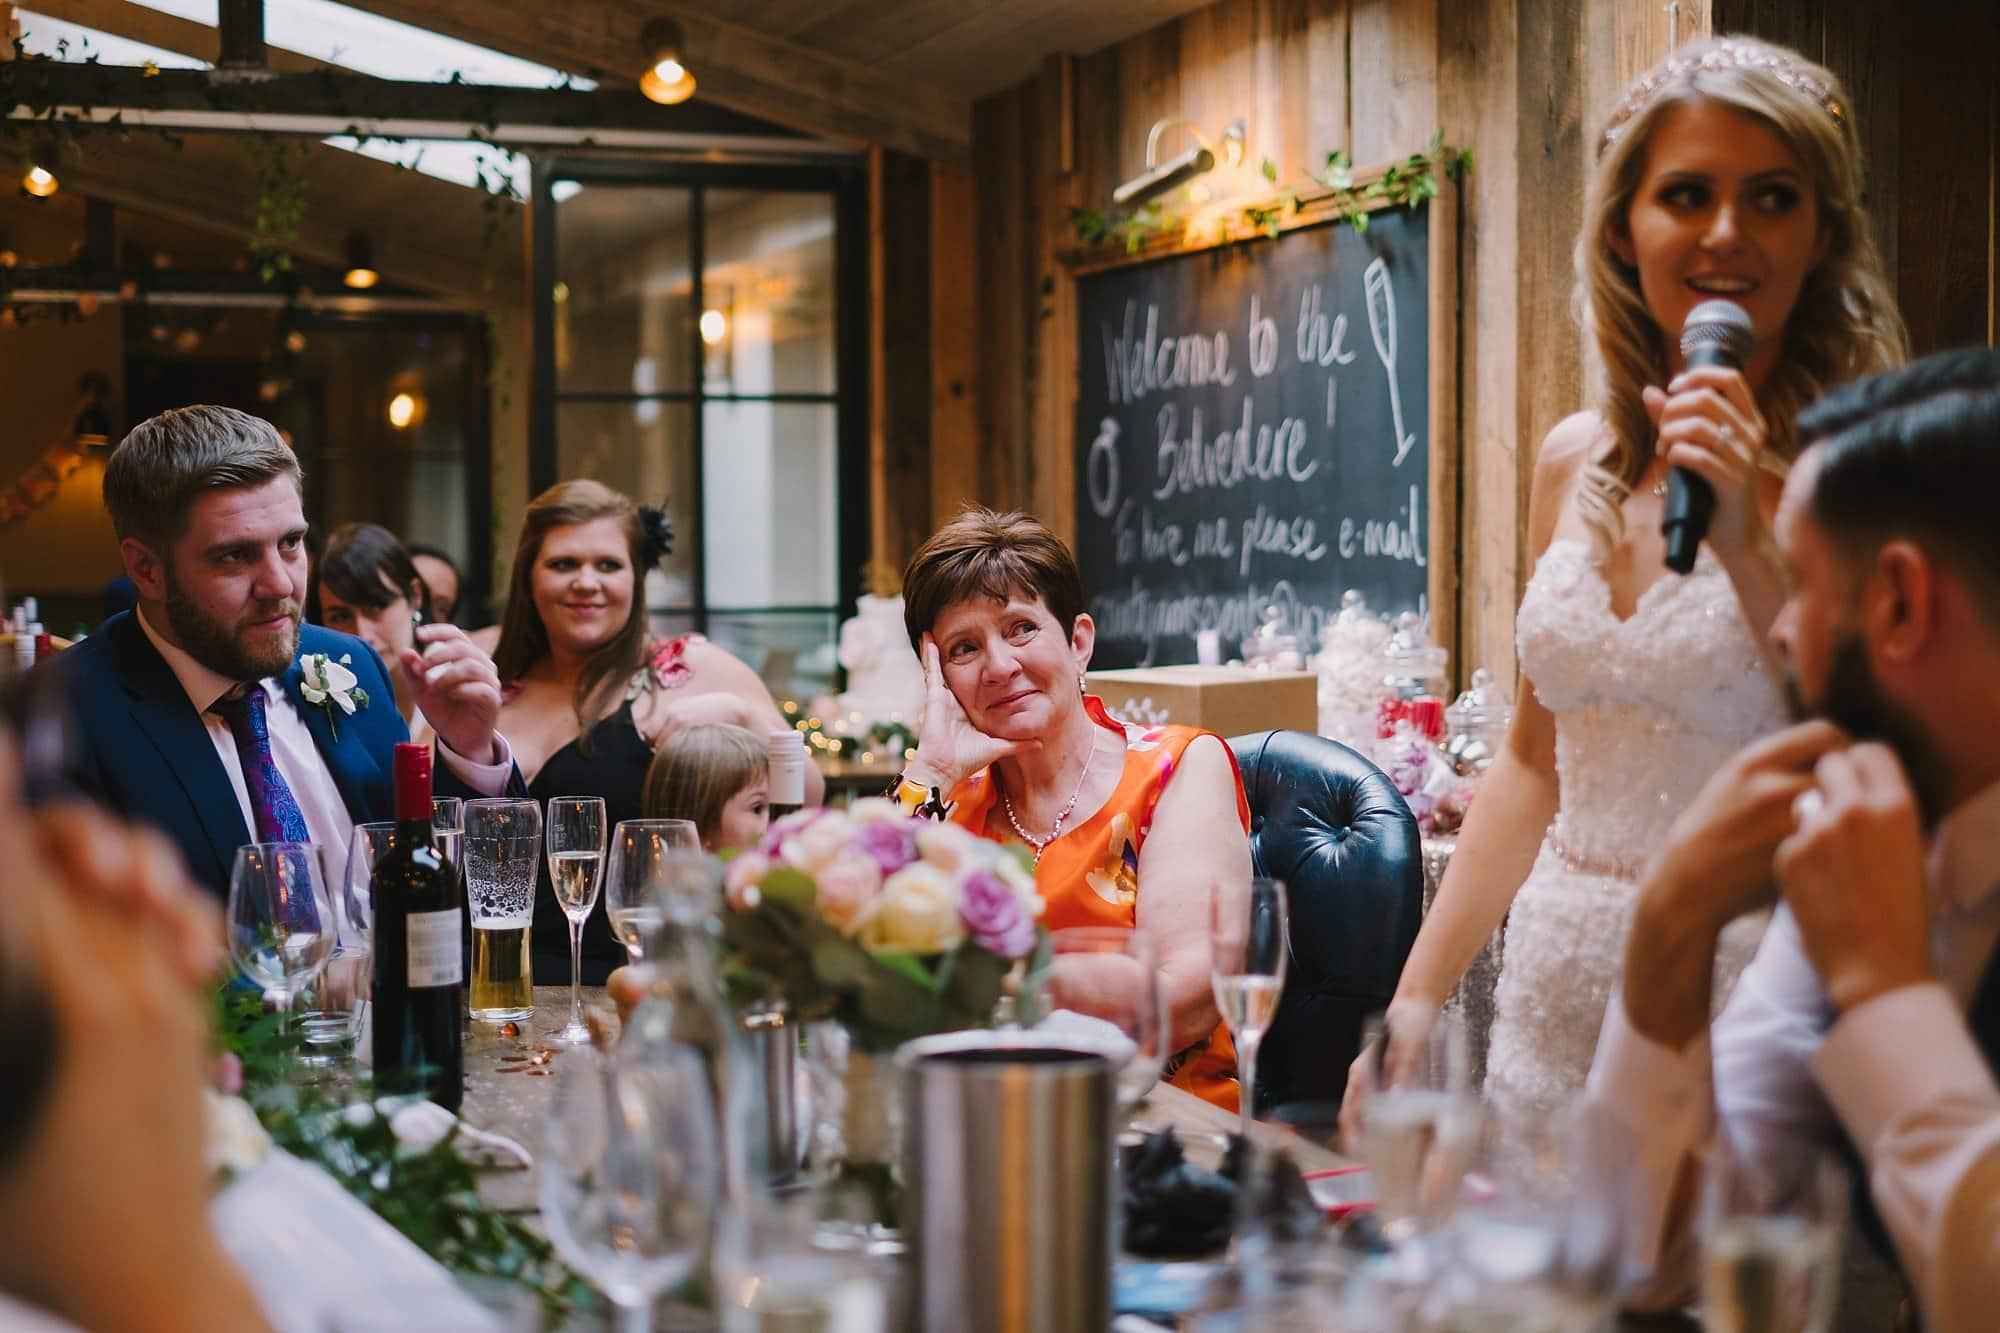 london pub wedding photographer jn 049 - The County Arms Wedding Photographer   Jen & Nick